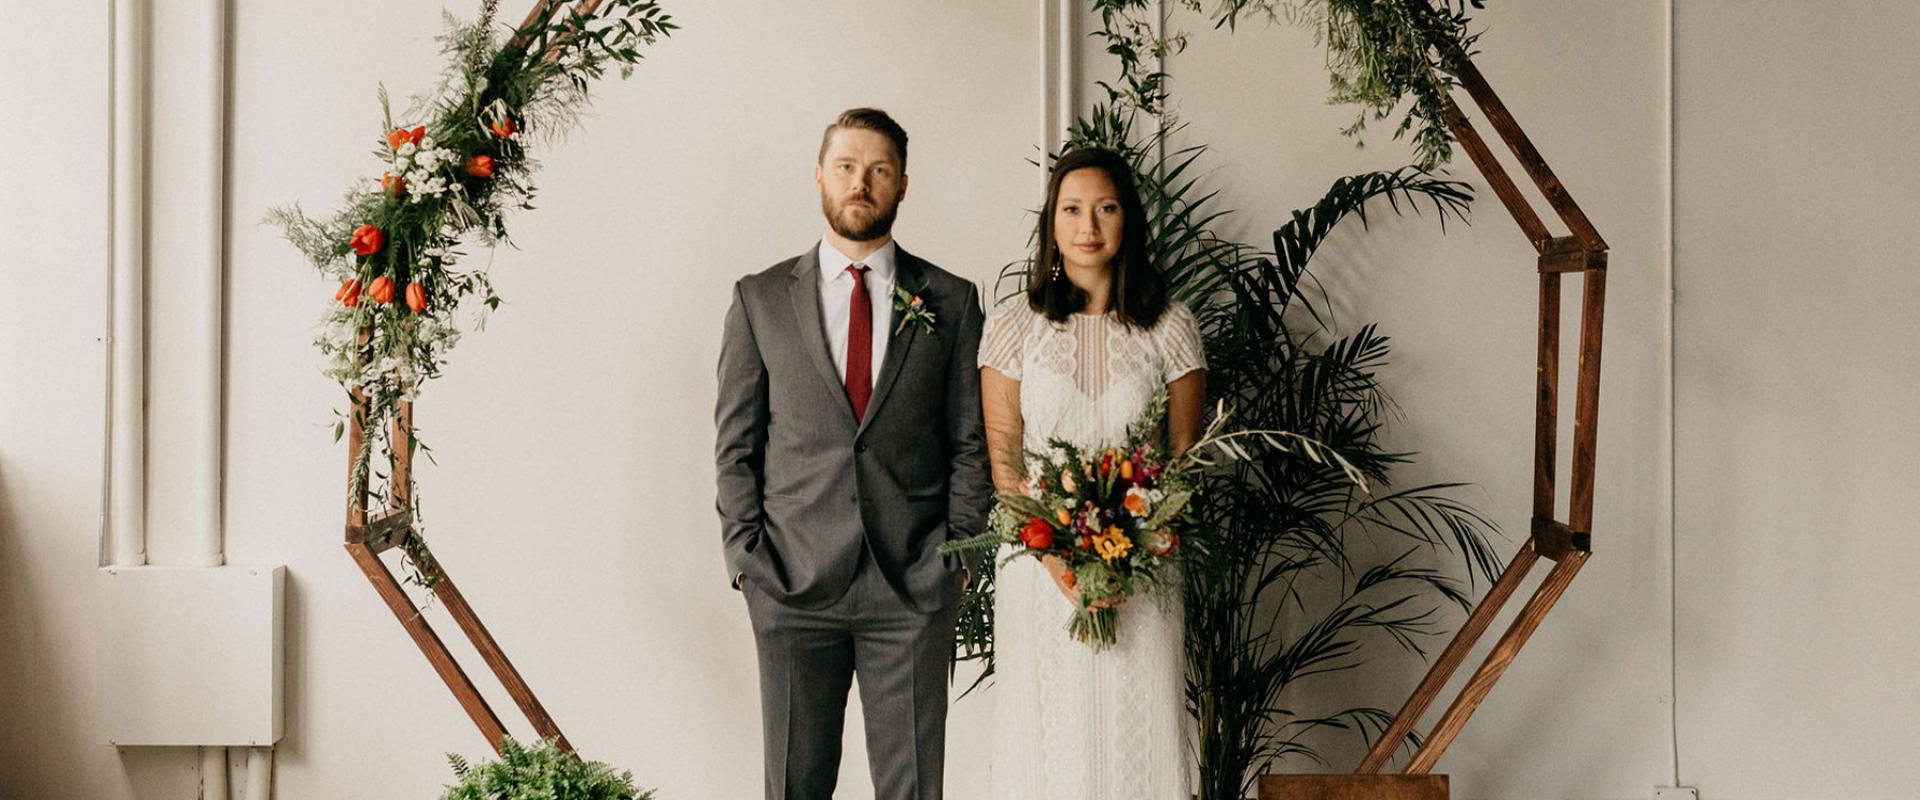 Eco-Friendly Wedding Design